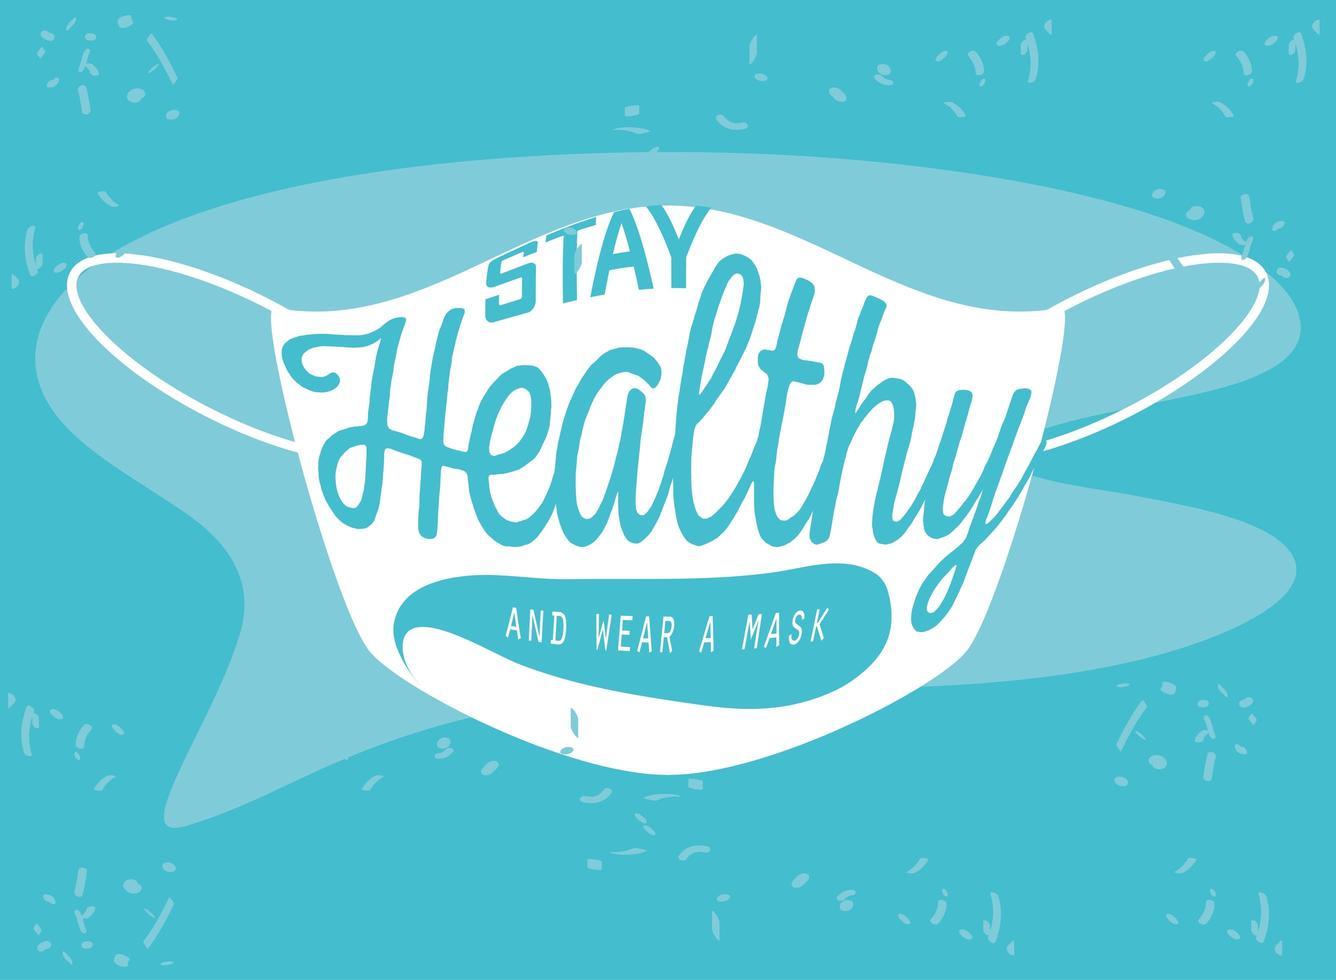 bescherm uzelf, draag een gezichtsmasker vector